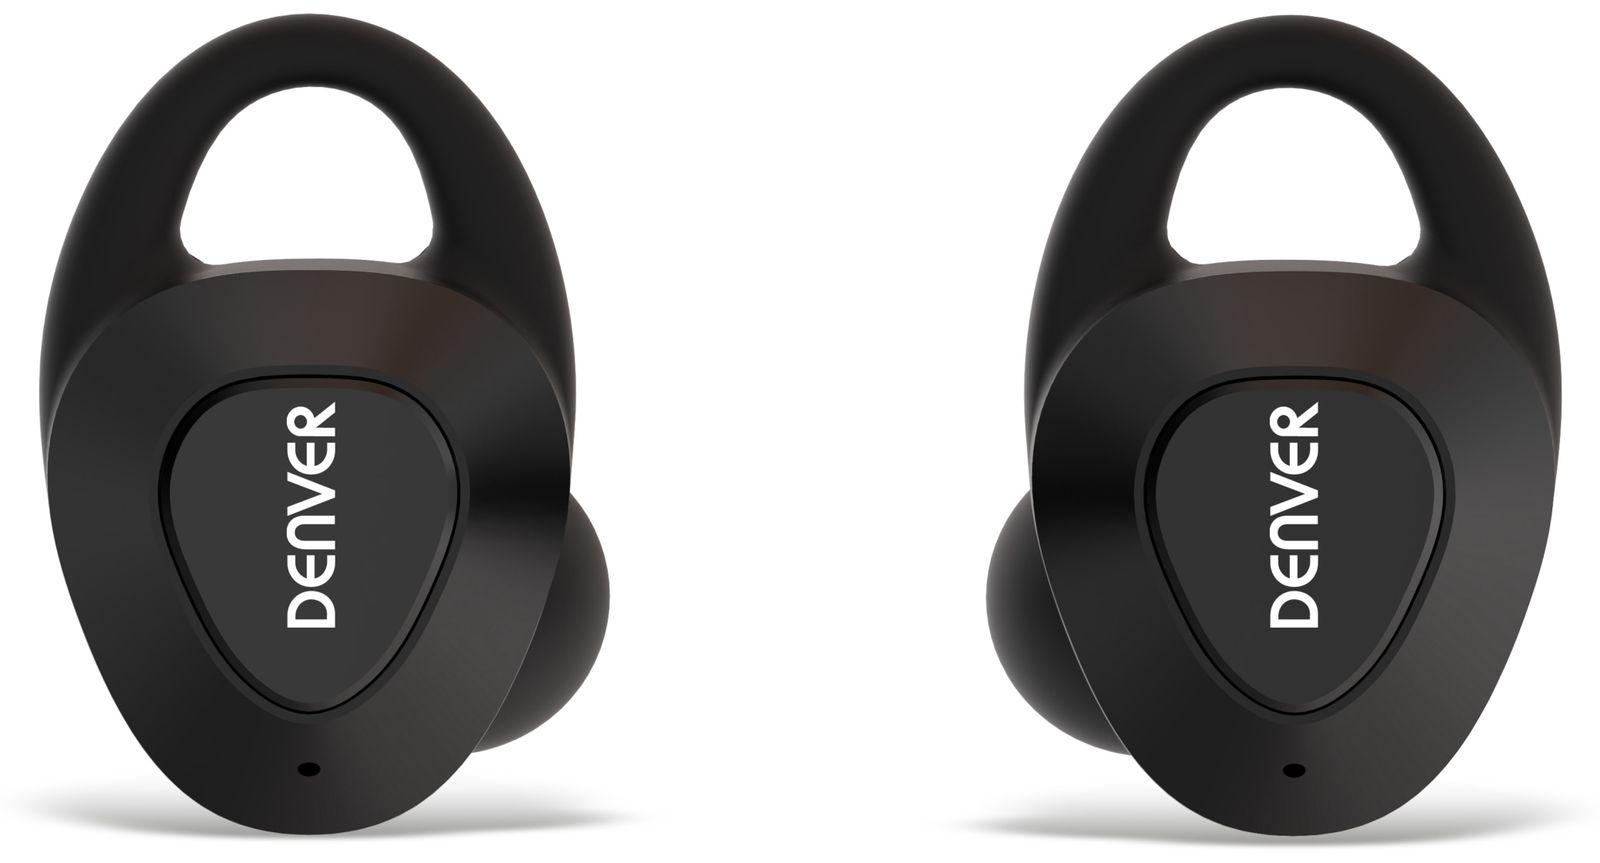 true wireless in ear headset denver twe 51 schwarz online. Black Bedroom Furniture Sets. Home Design Ideas